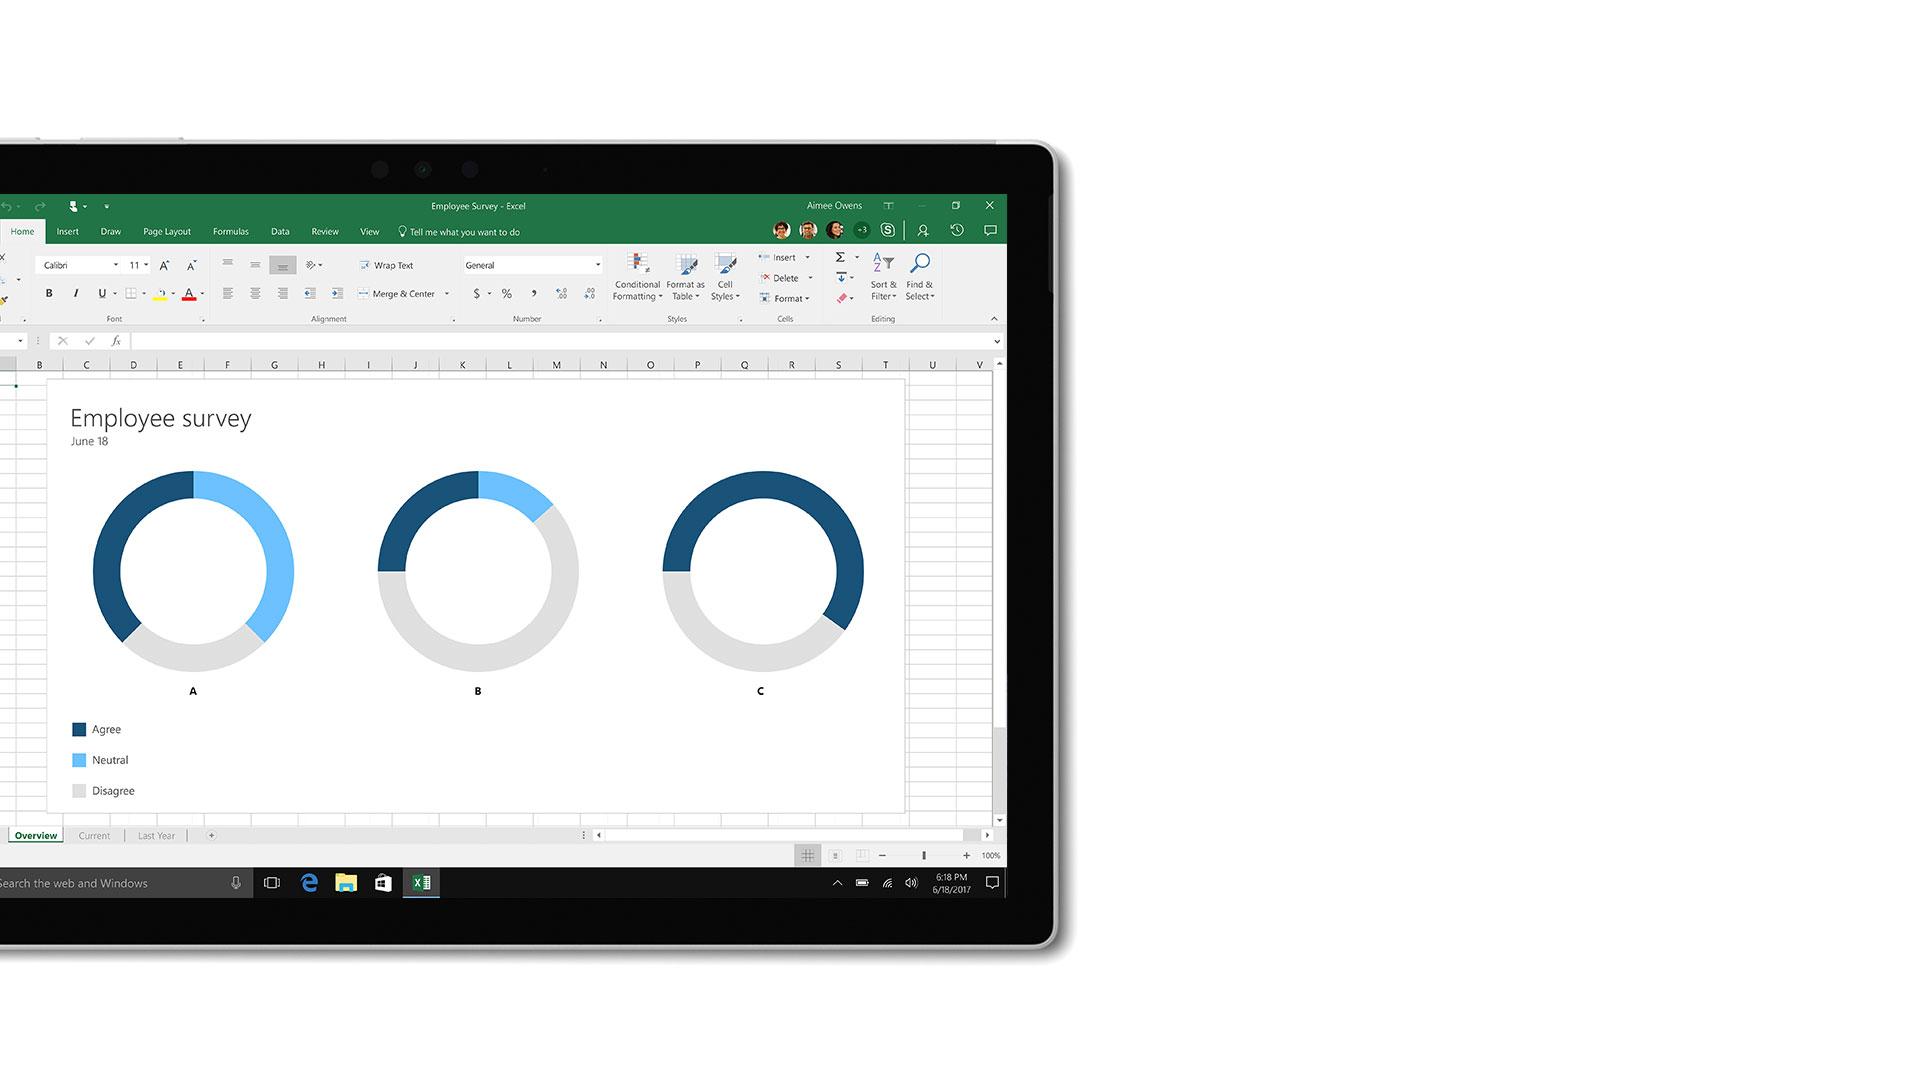 Imej antara muka pengguna Microsoft Excel